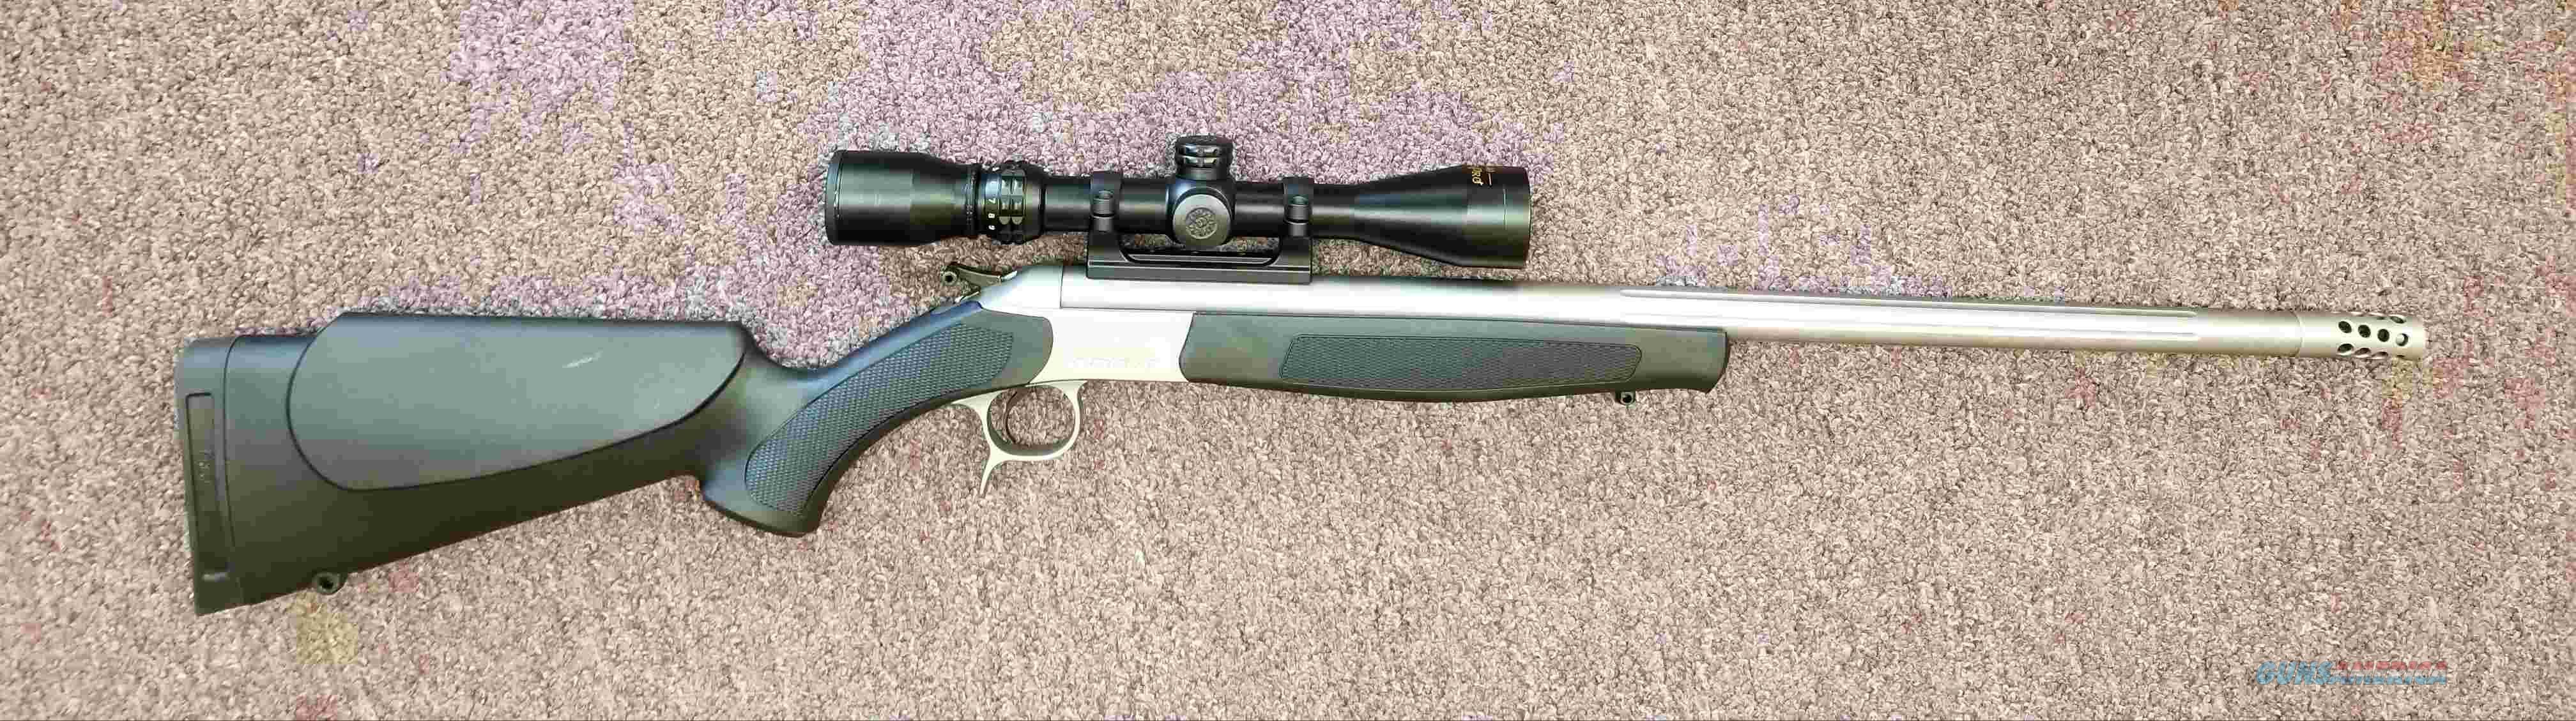 CVA Scout 45/70 - Optics - Muzzle Brake - Free Shipping !!  Guns > Rifles > C Misc Rifles